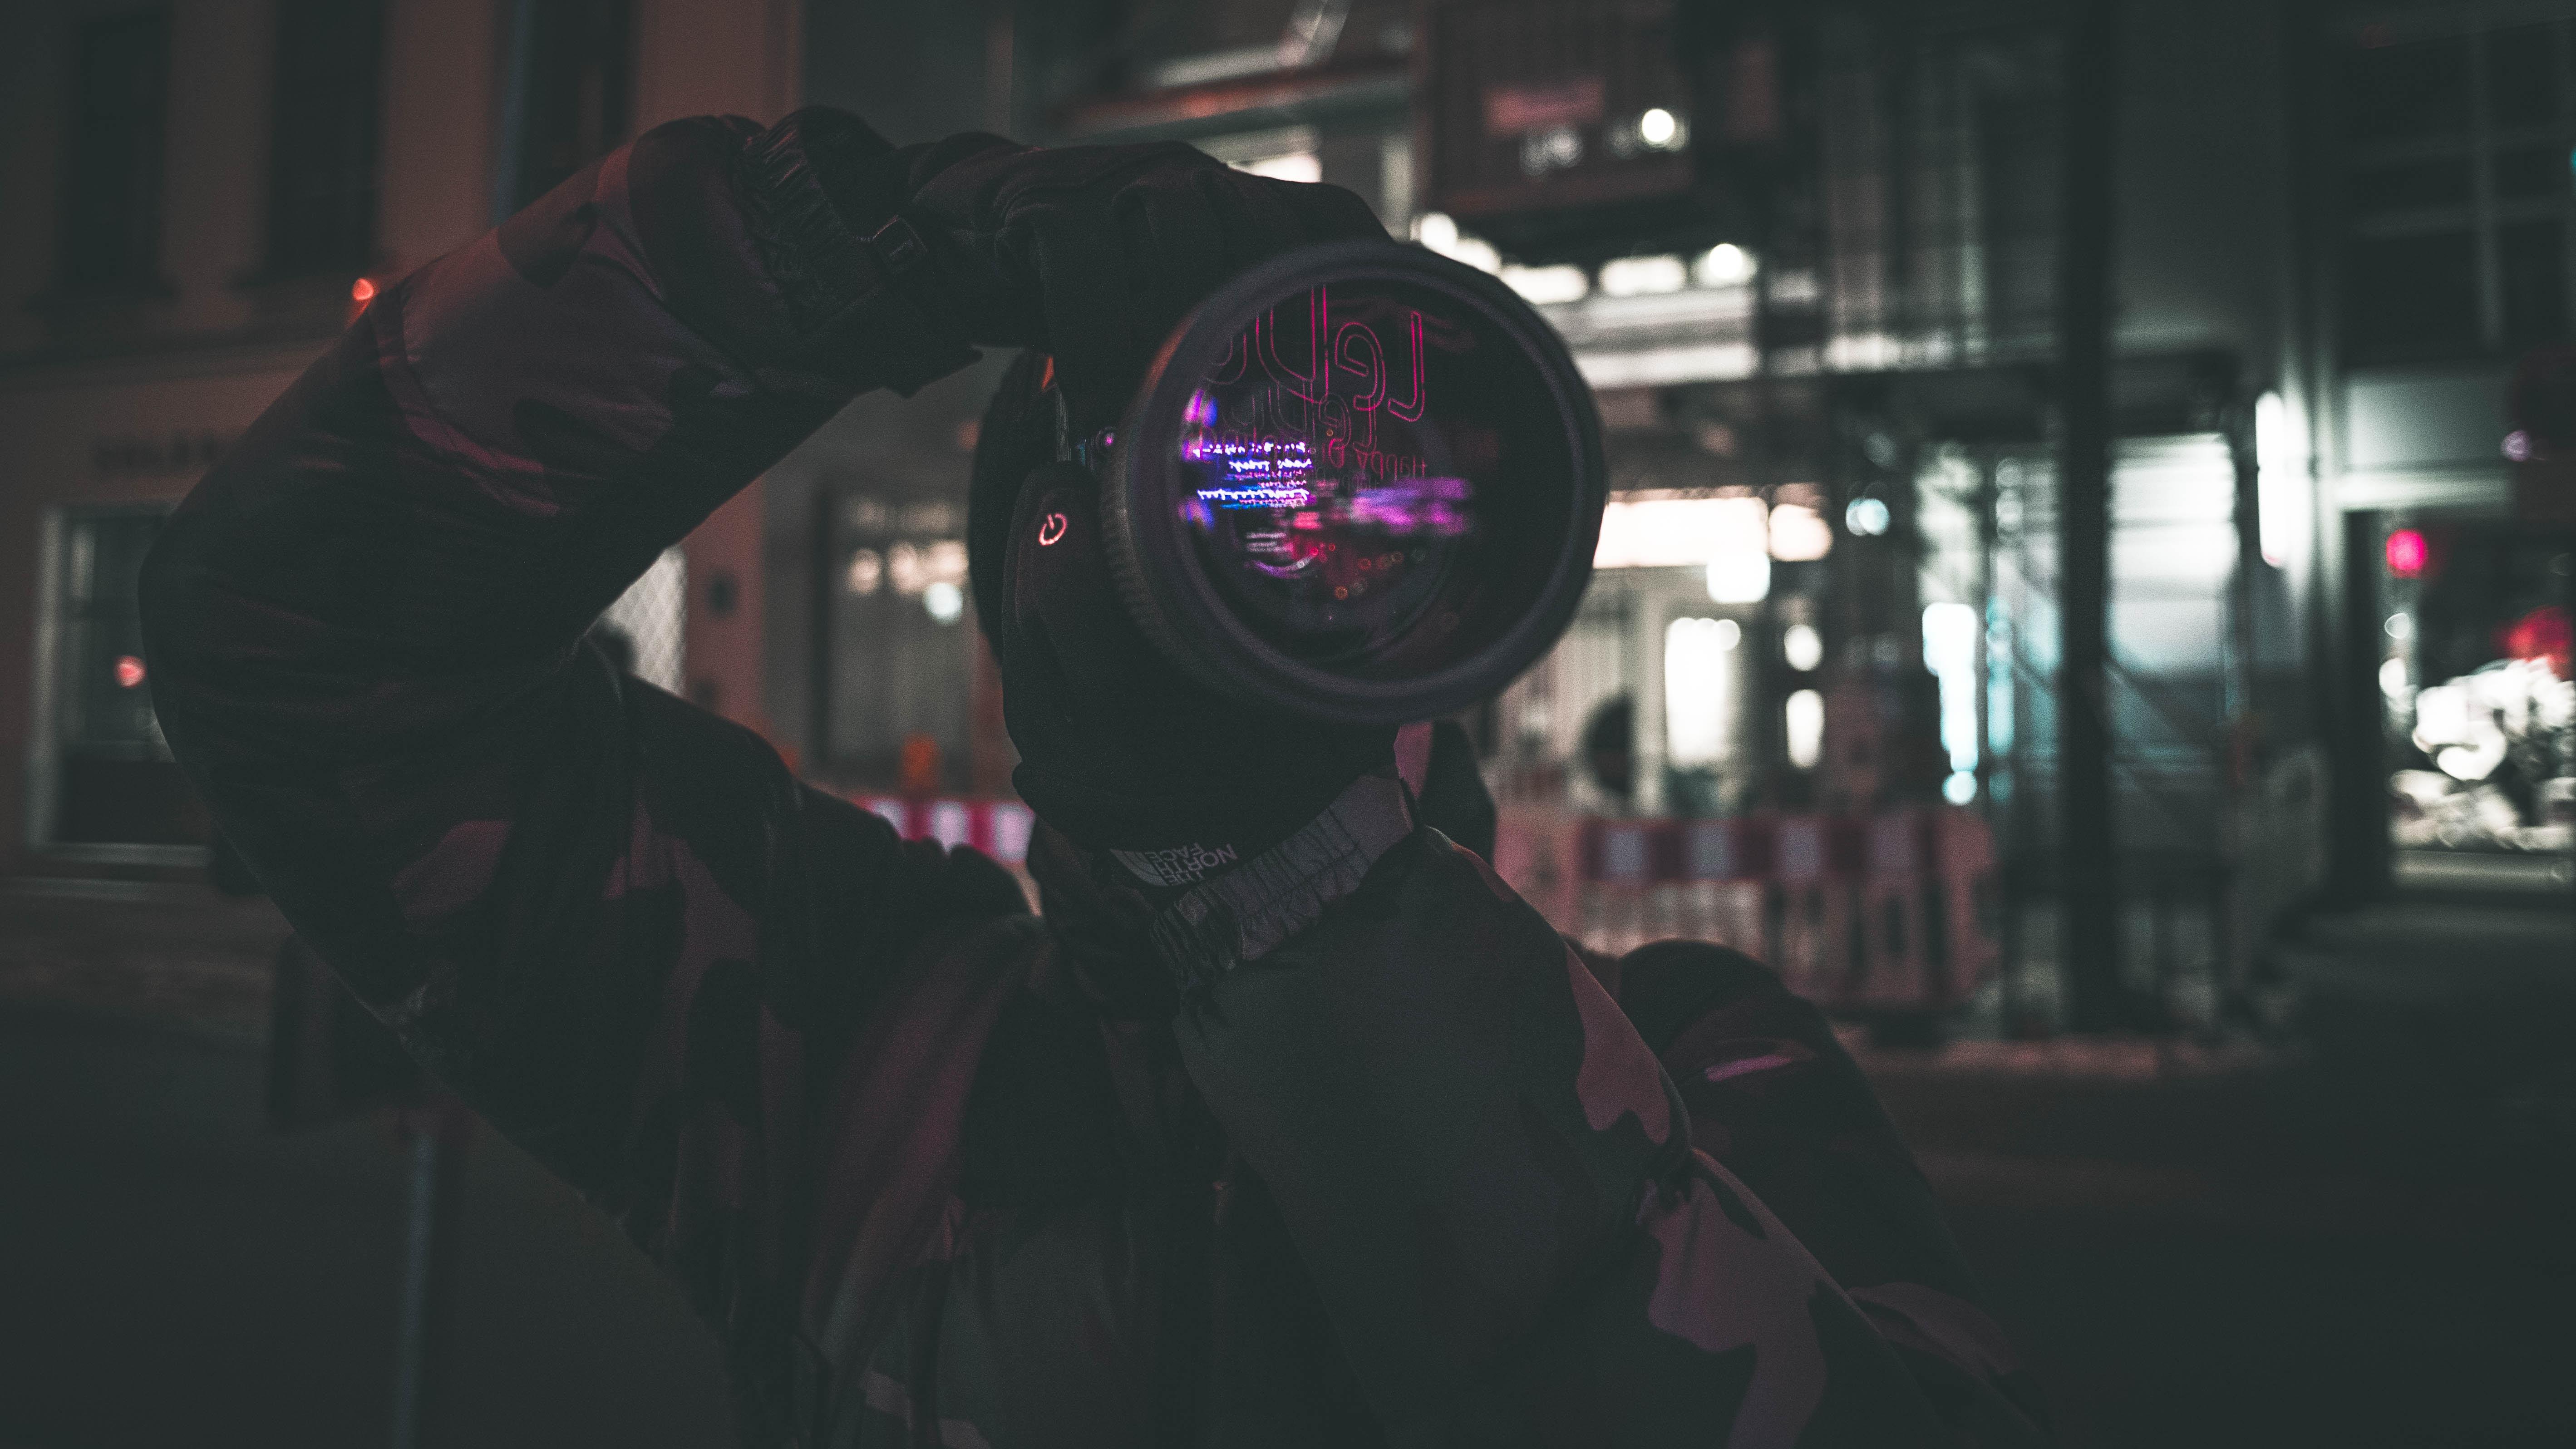 man holding camera standing near building